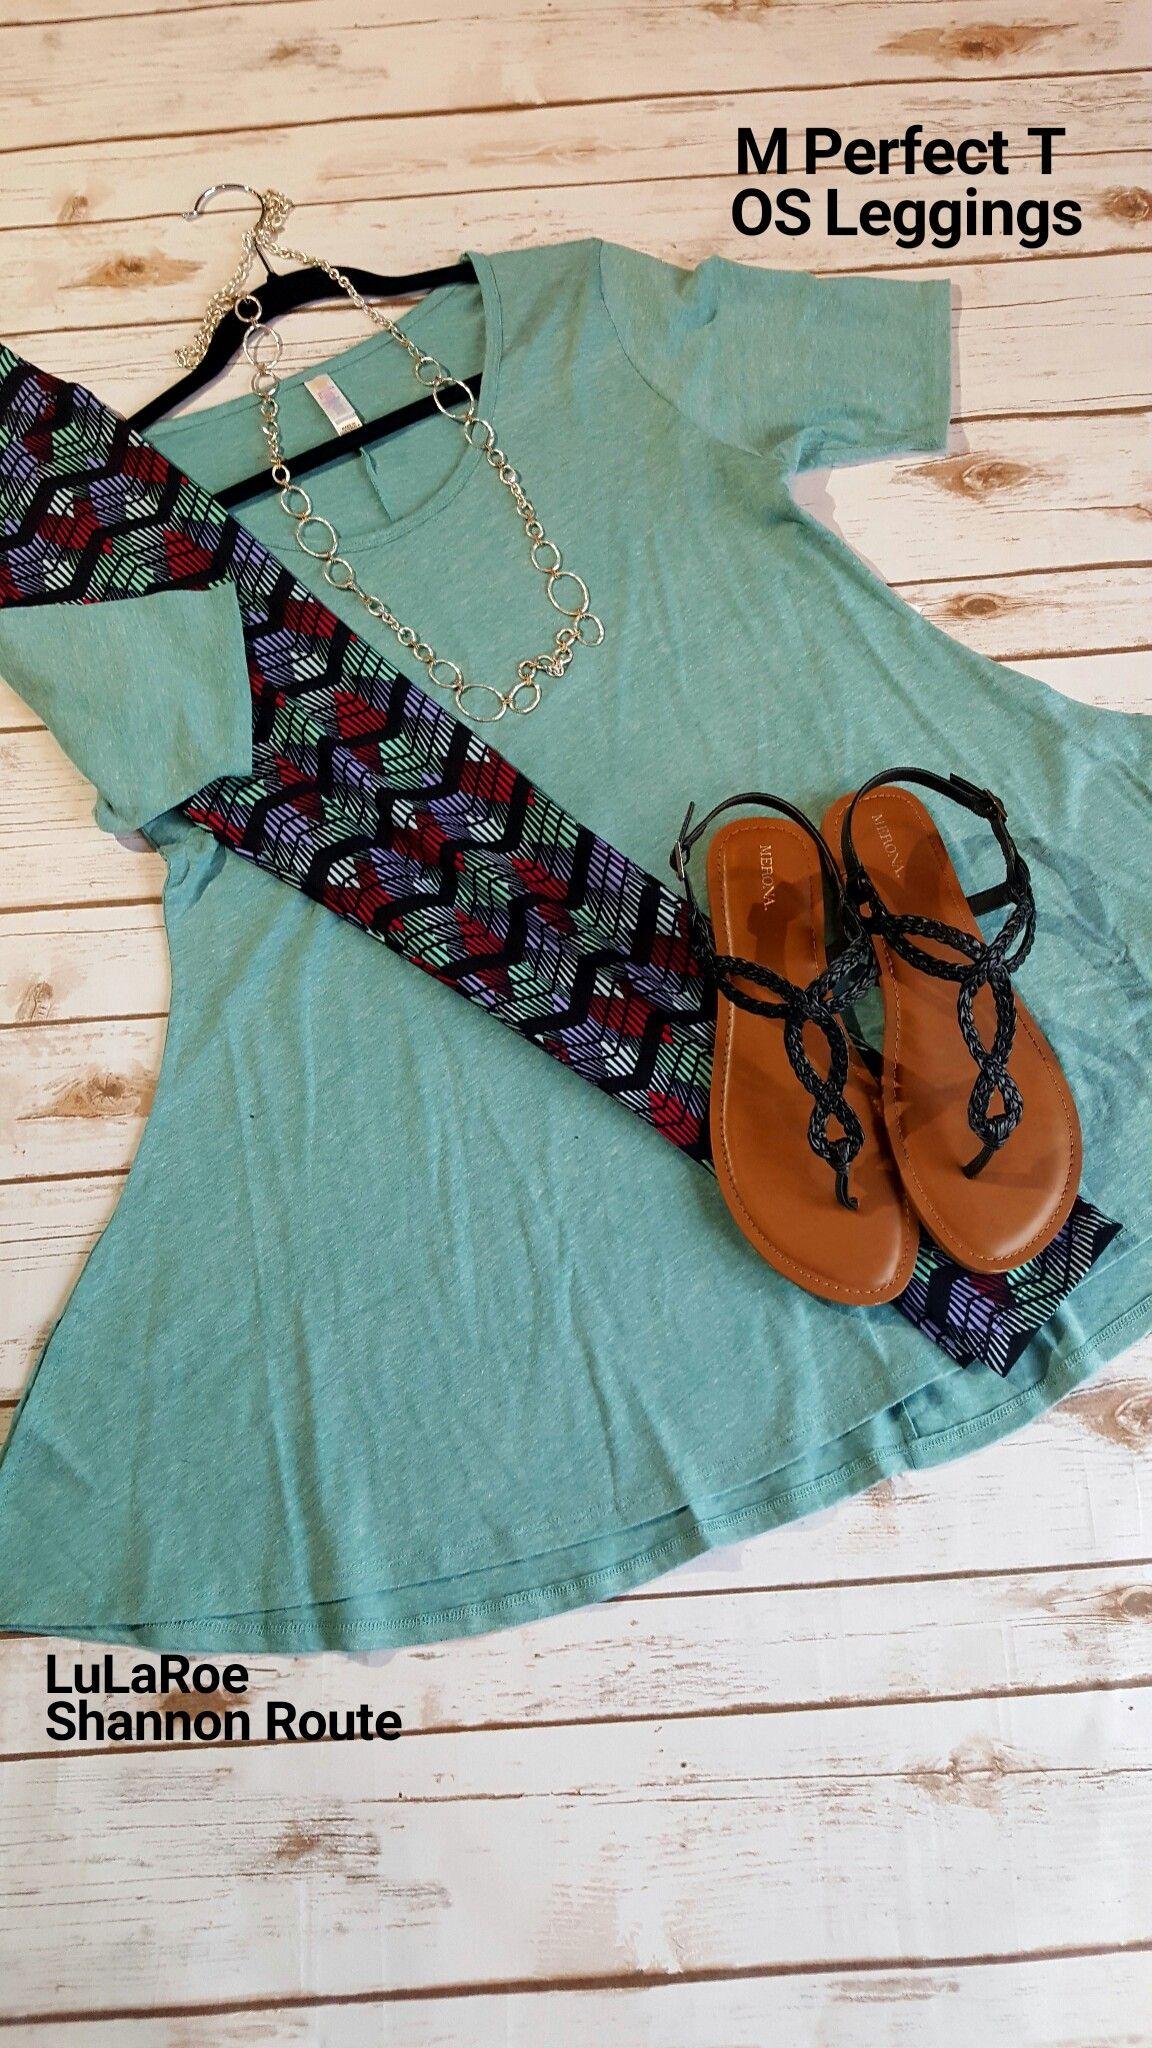 Great outfit for spring! #lularoe #lularoeoutfit #lularoeperfecttee #leggings #lularoeshannonroute #lularoeleggings